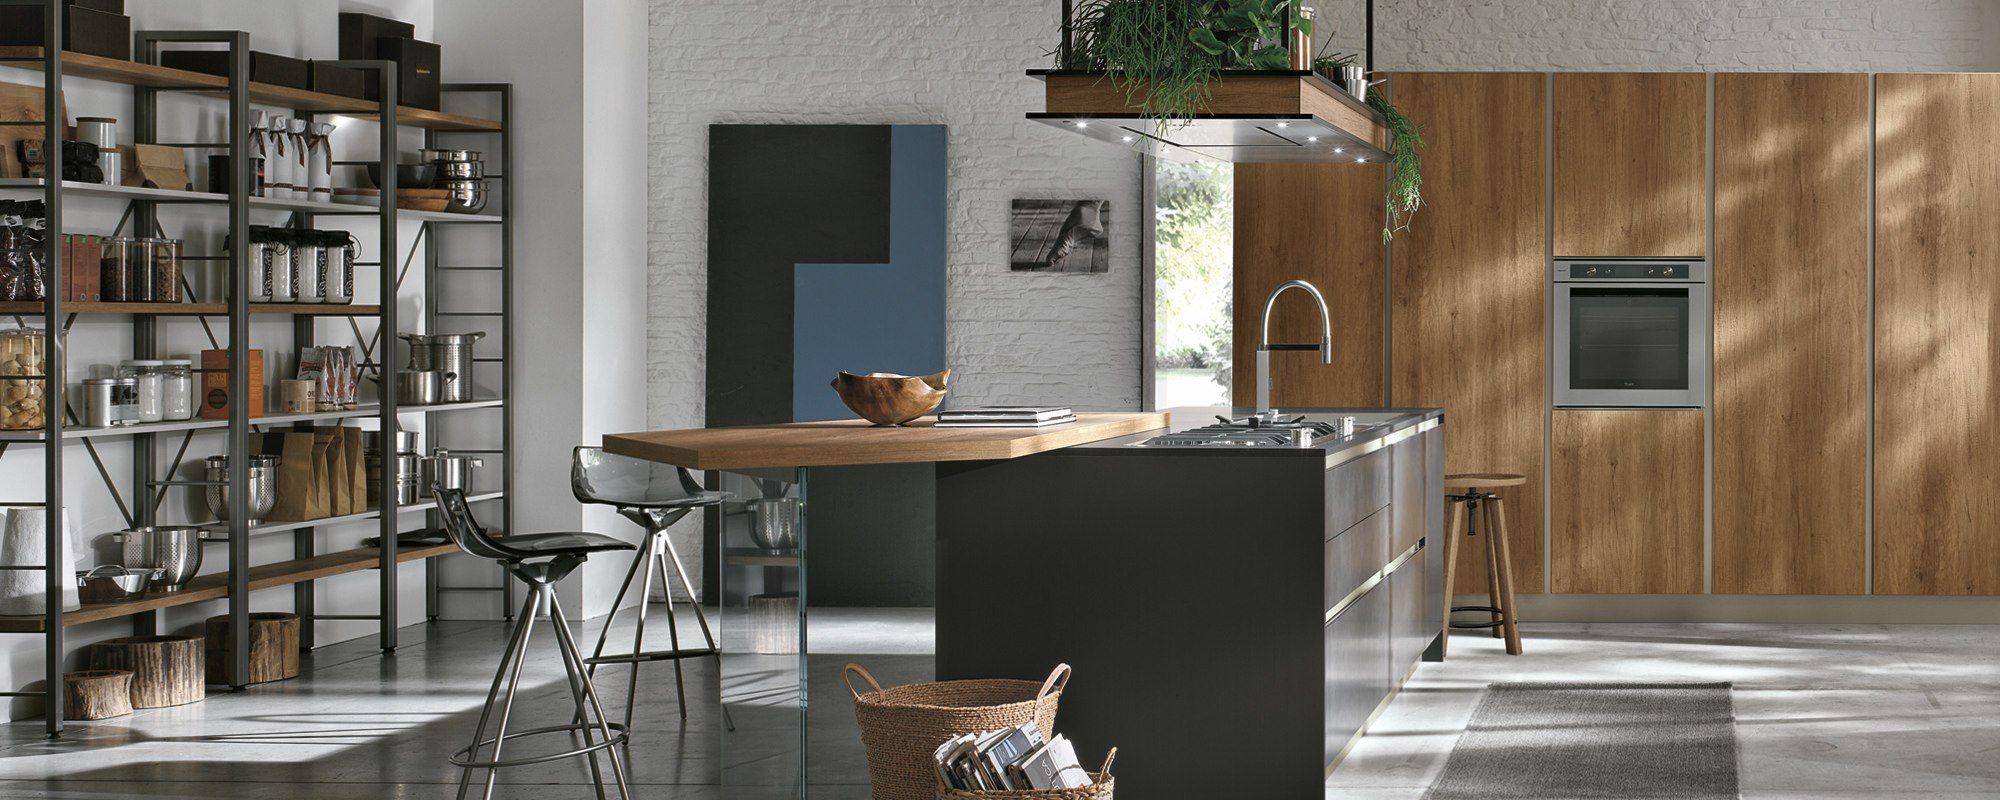 Cucina Stosa Infinity! (http://www.stosacucine.com/cucine/1-cucine ...